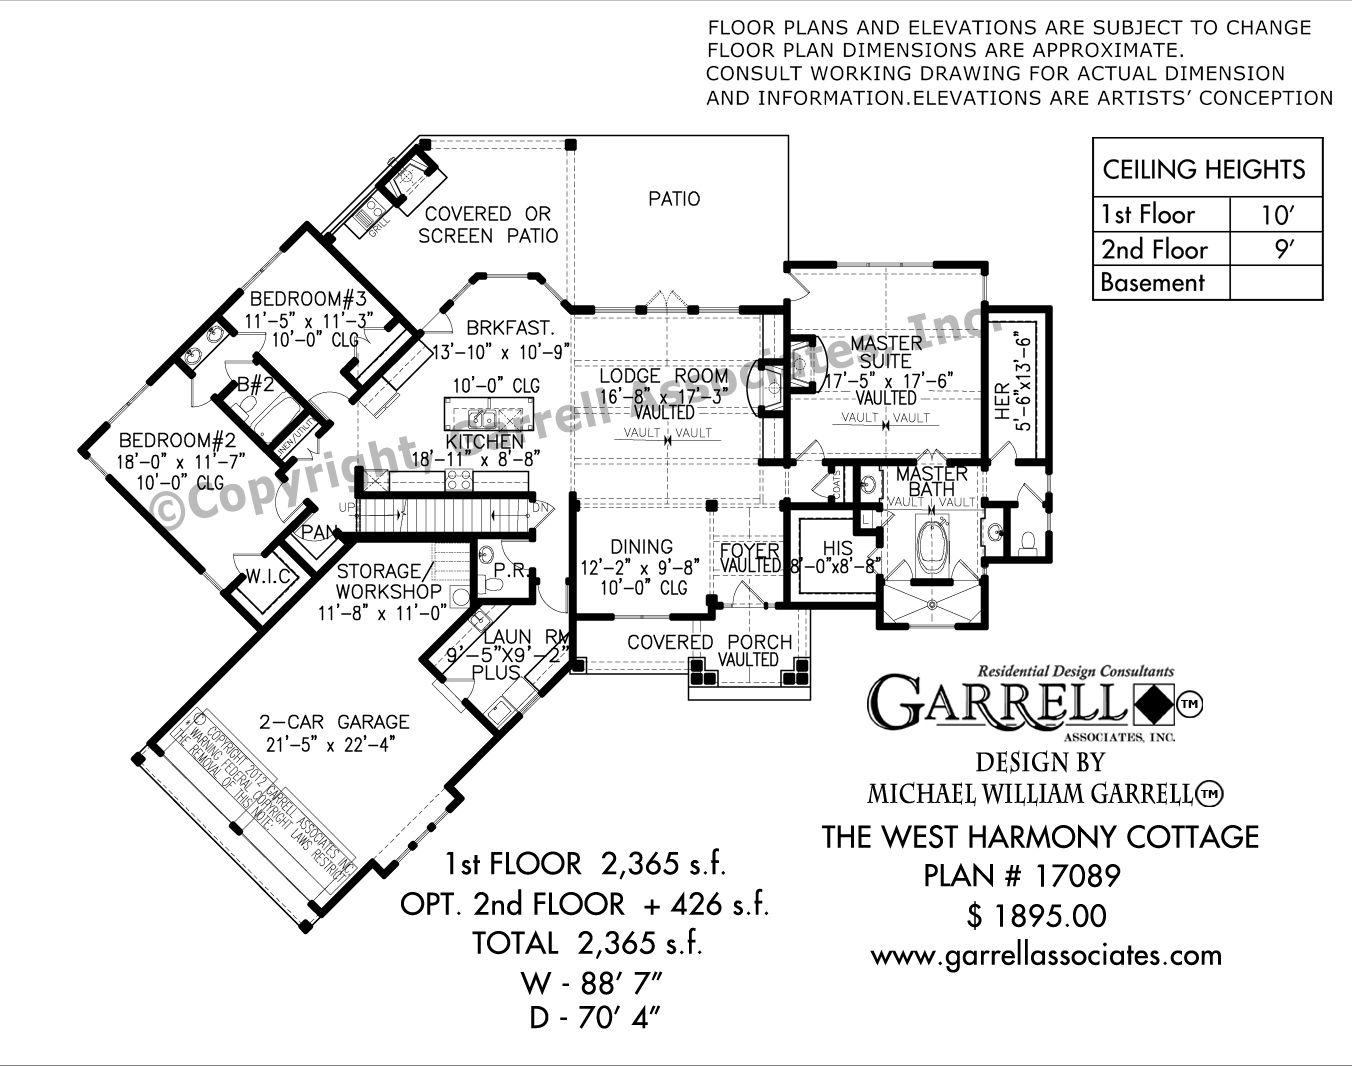 West Harmony Cottage 17089 Garrell Associates Inc Cottage House Plans Floor Plans Craftsman Style House Plans